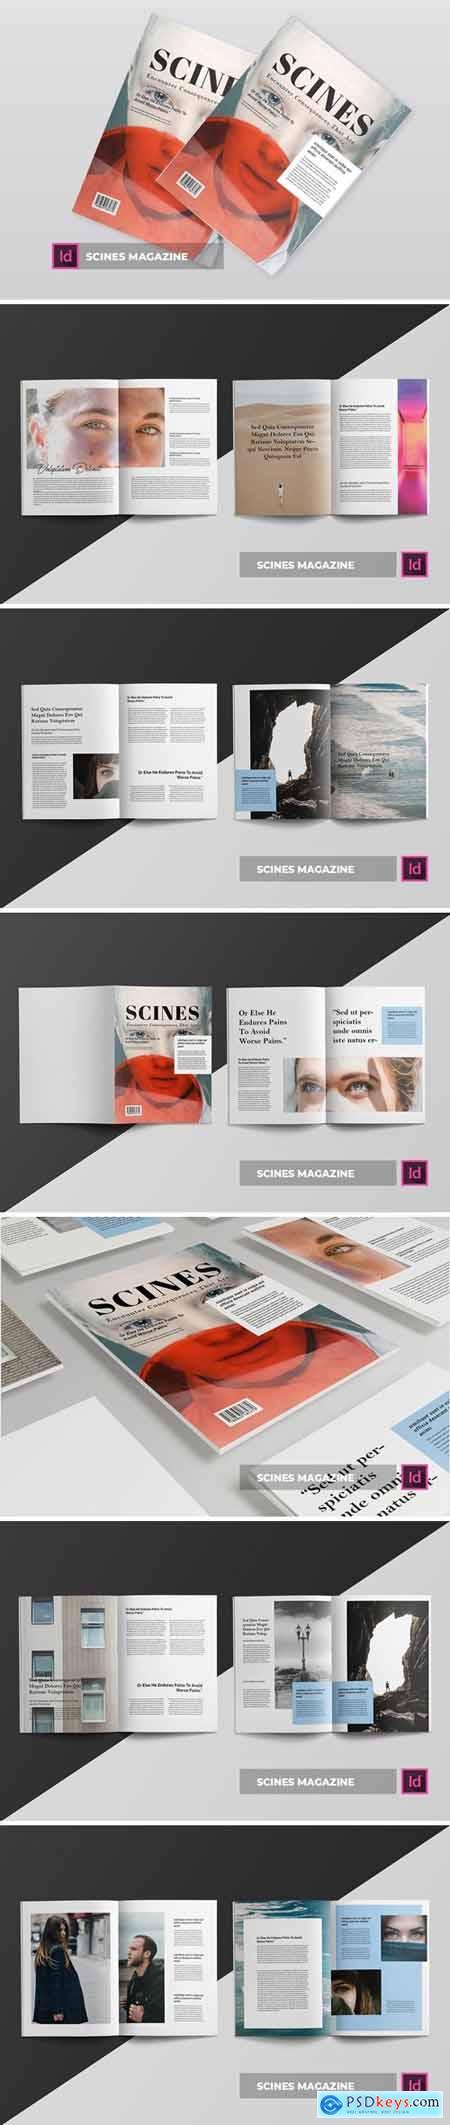 Scines Magazine Template